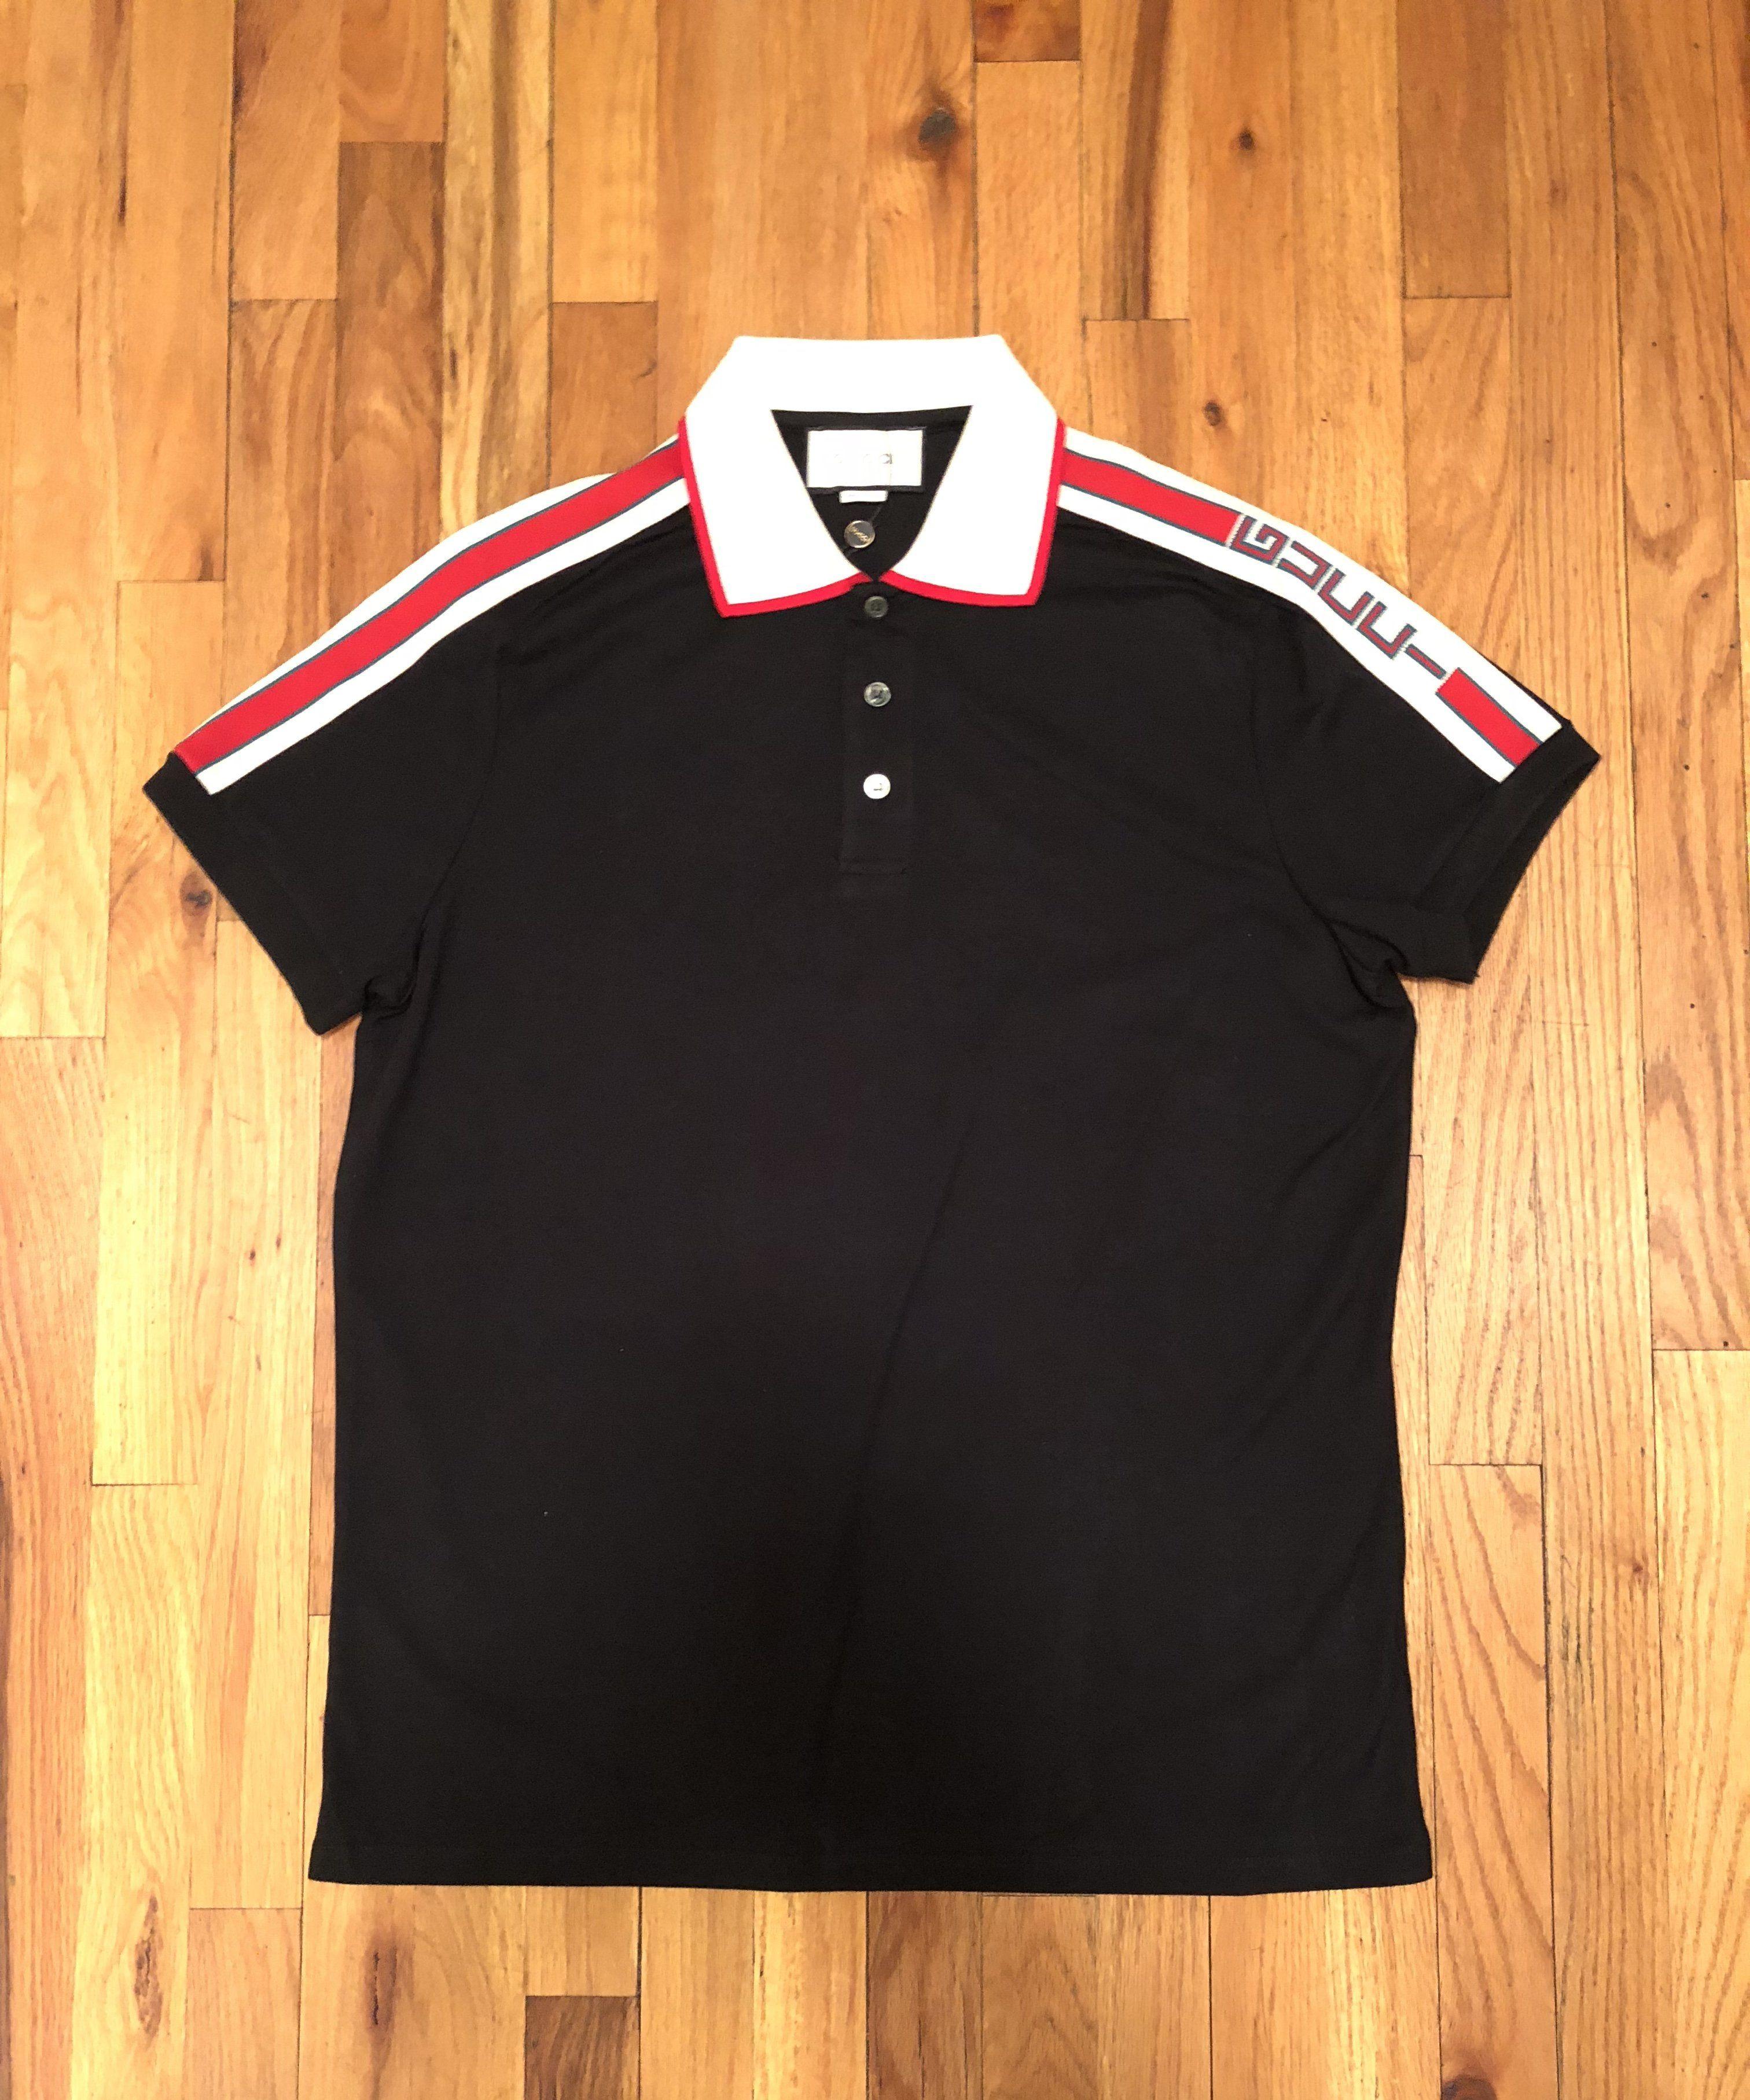 65e89f453aea88 Gucci Black Polo with Jacquard Stripe